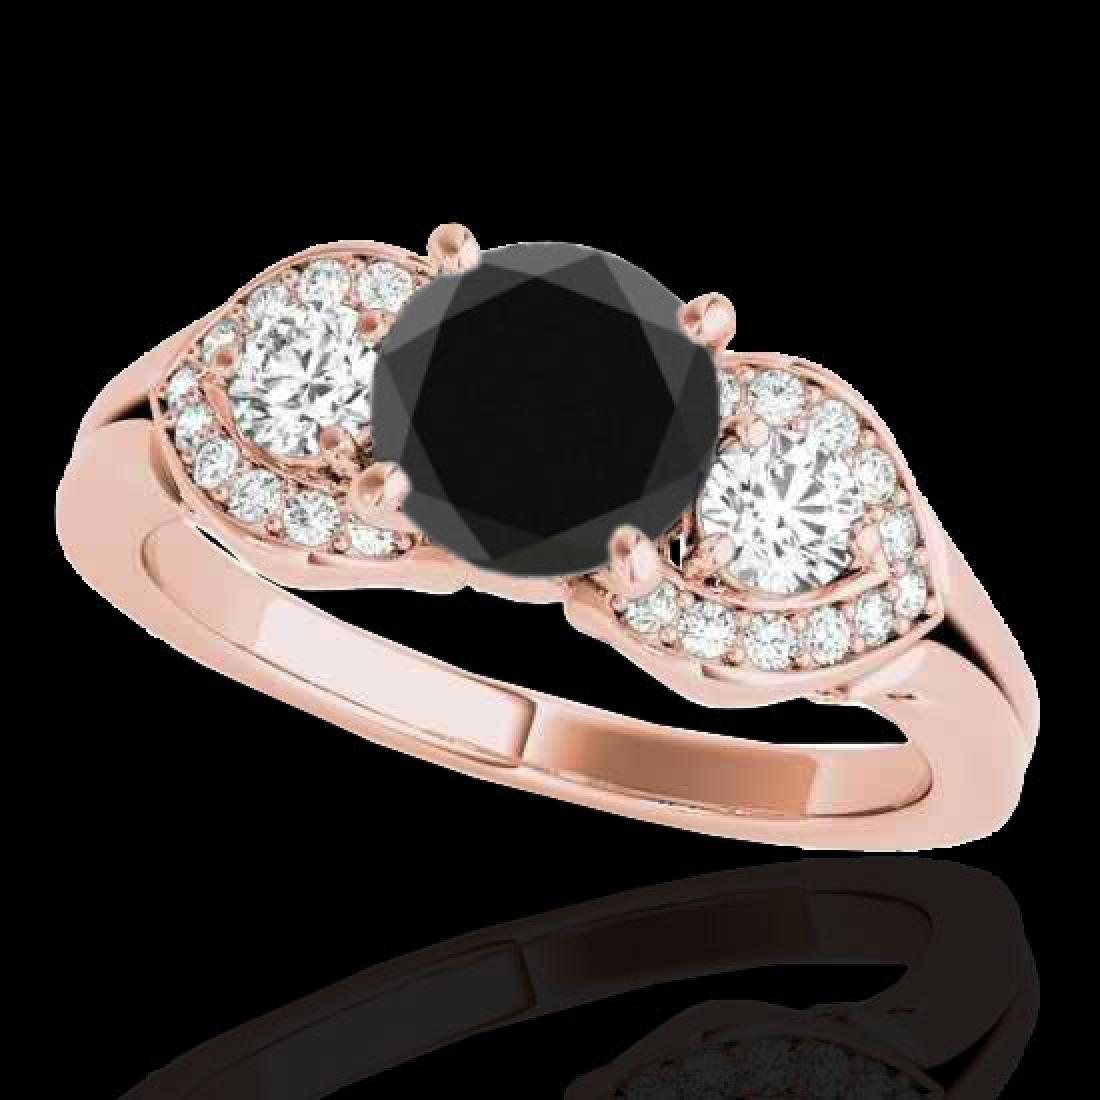 1.7 CTW Certified VS Black Diamond 3 Stone Solitaire